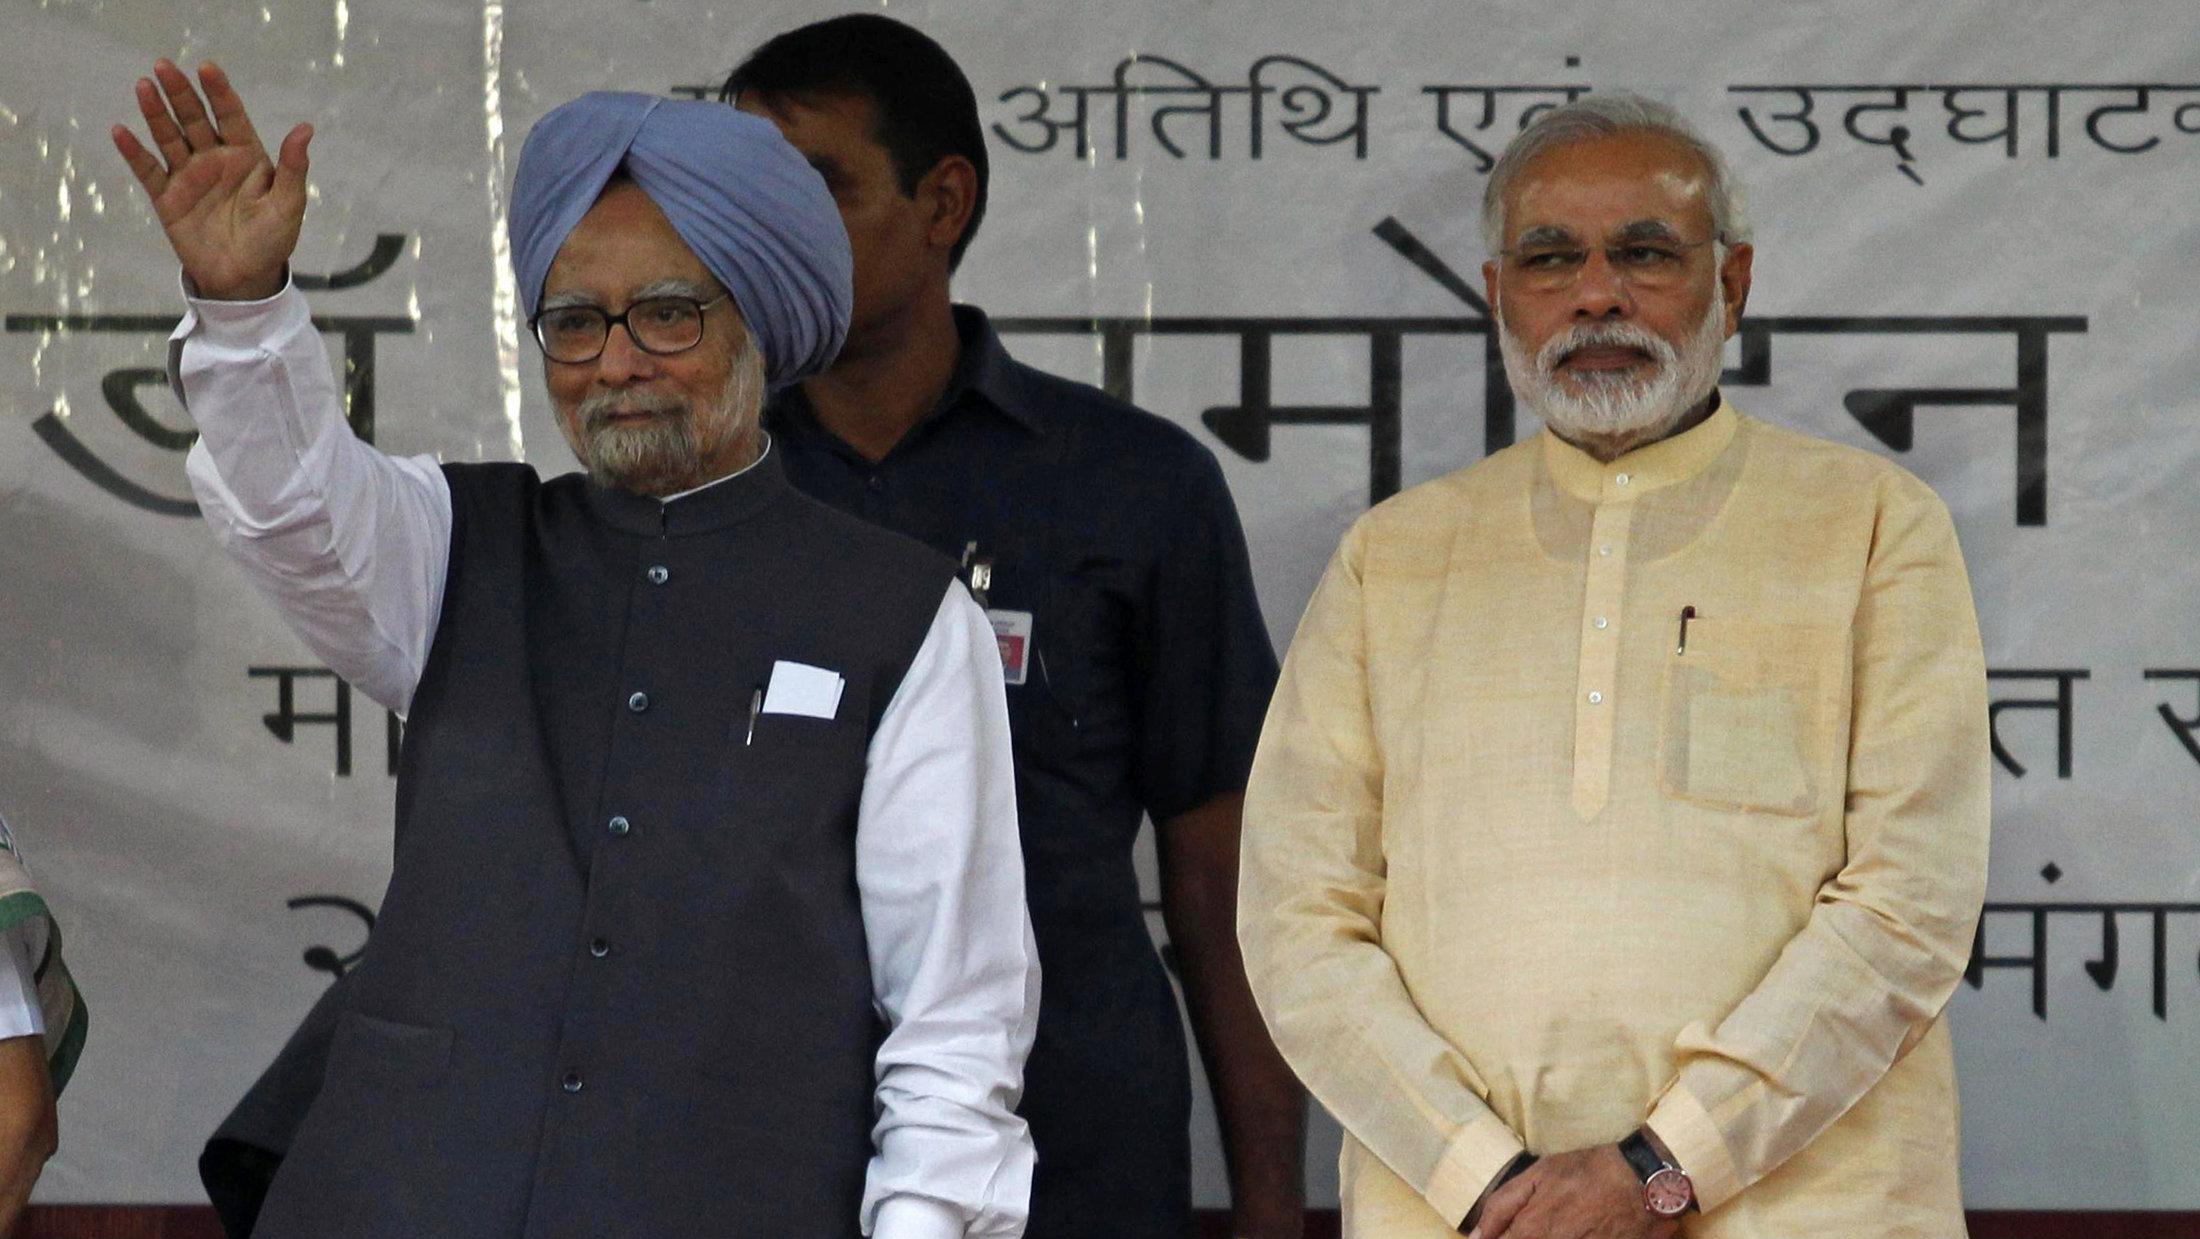 """Wave goodbye to all those followers, Modi."""